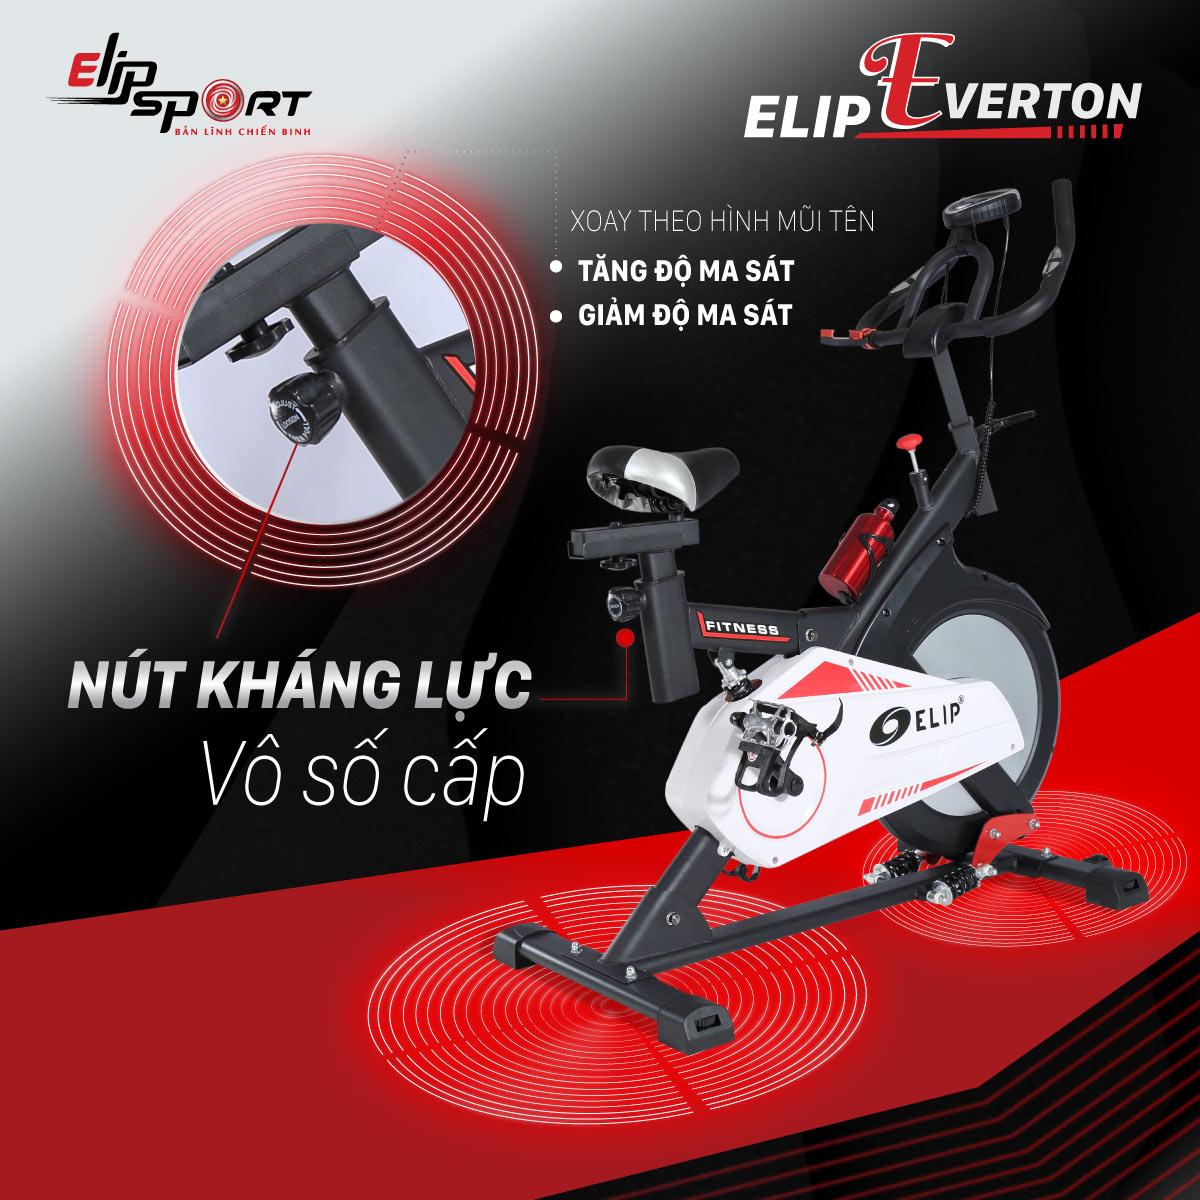 Xe đạp tập ELIP Everton